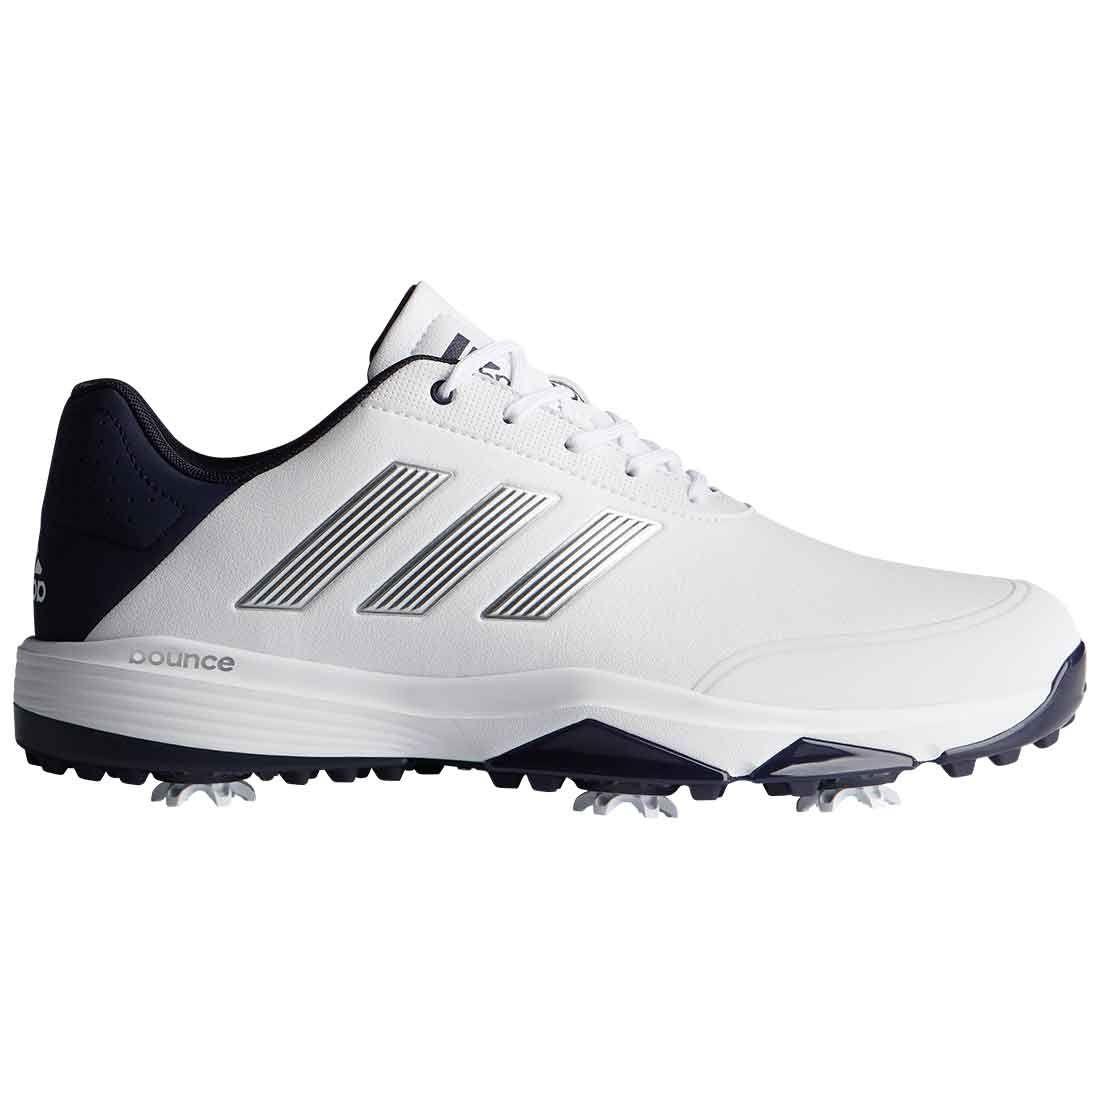 Buy Adidas AdiPower Bounce Golf Shoes